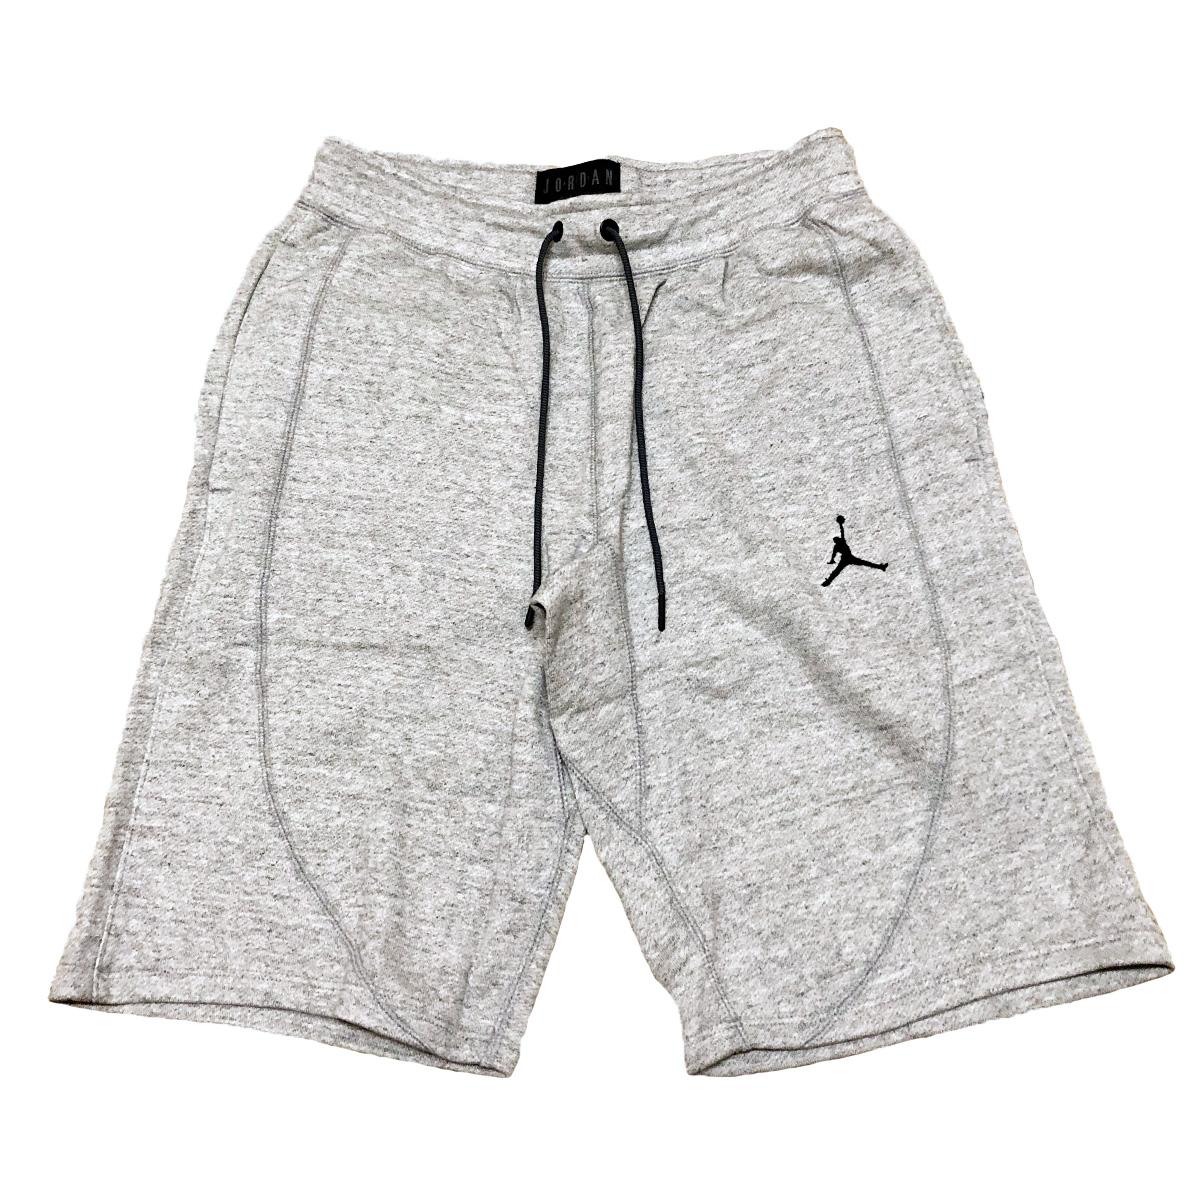 13fcf8f6730 SELECT SHOP LOWTEX: NIKE JORDAN SPORTSWEAR WINGS LITE SHORTS Nike Jordan  sportswear wings light shorts GREY | Rakuten Global Market